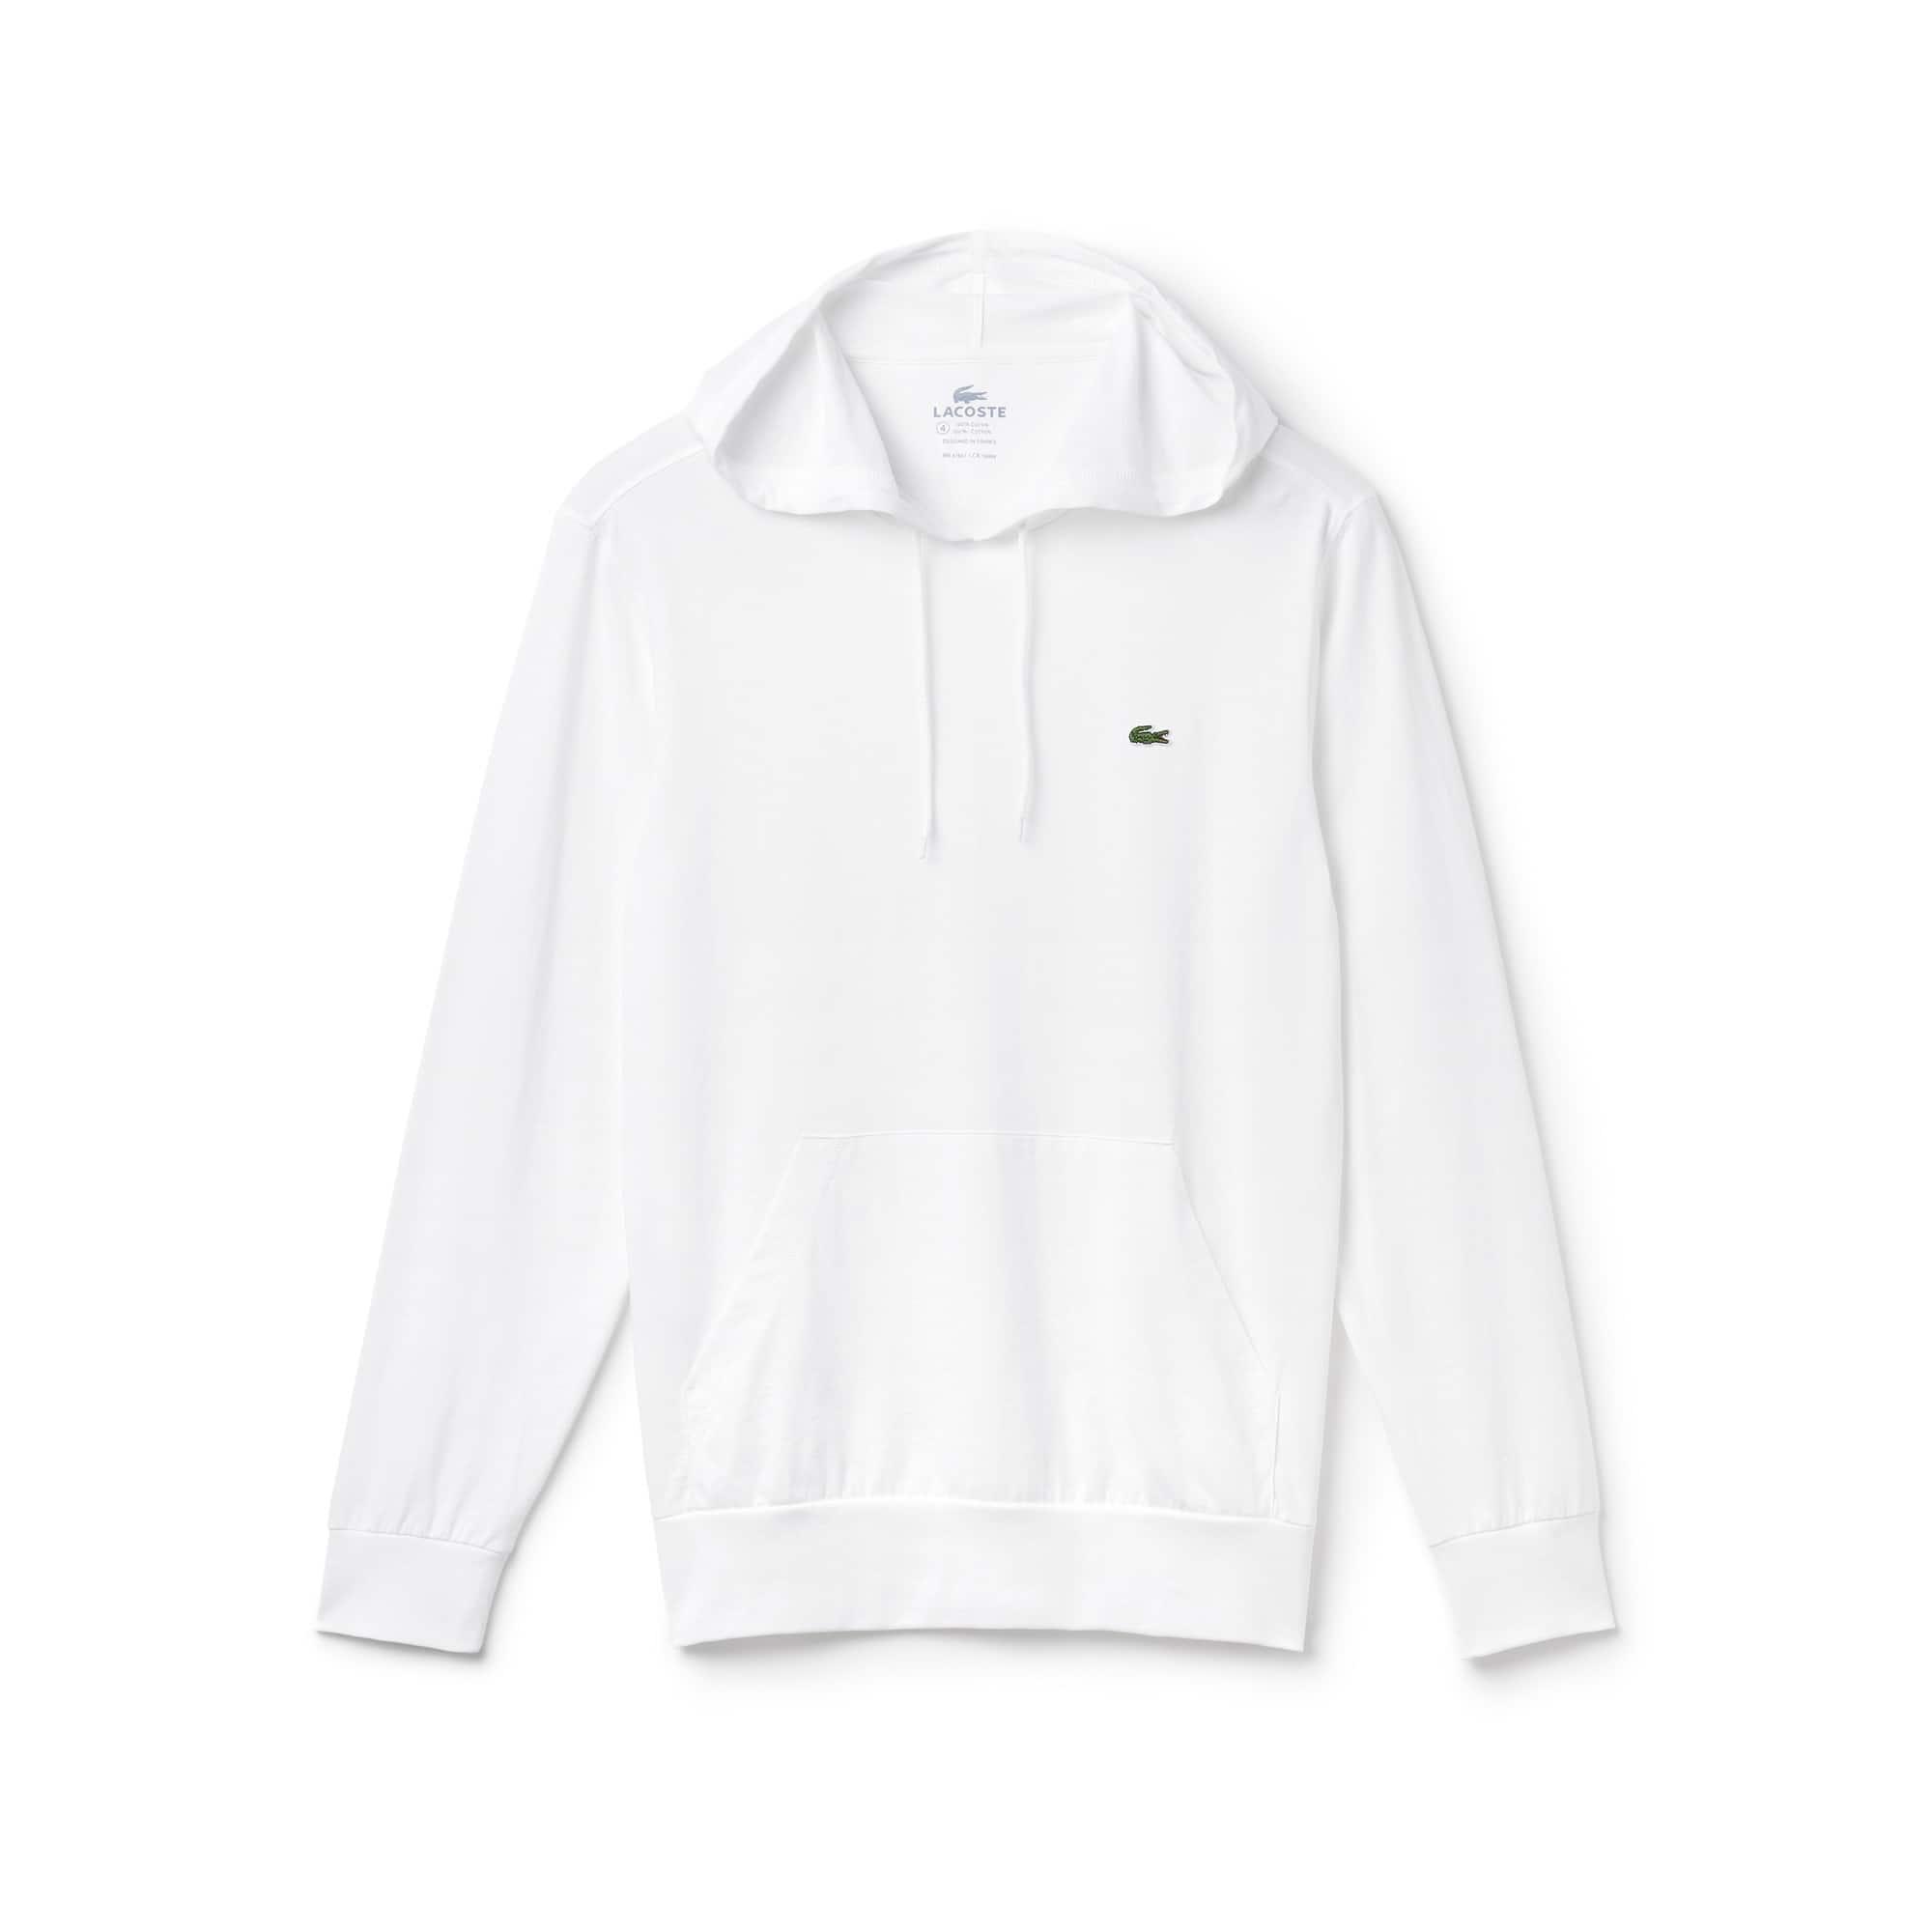 Men's Cotton Hooded T-Shirt